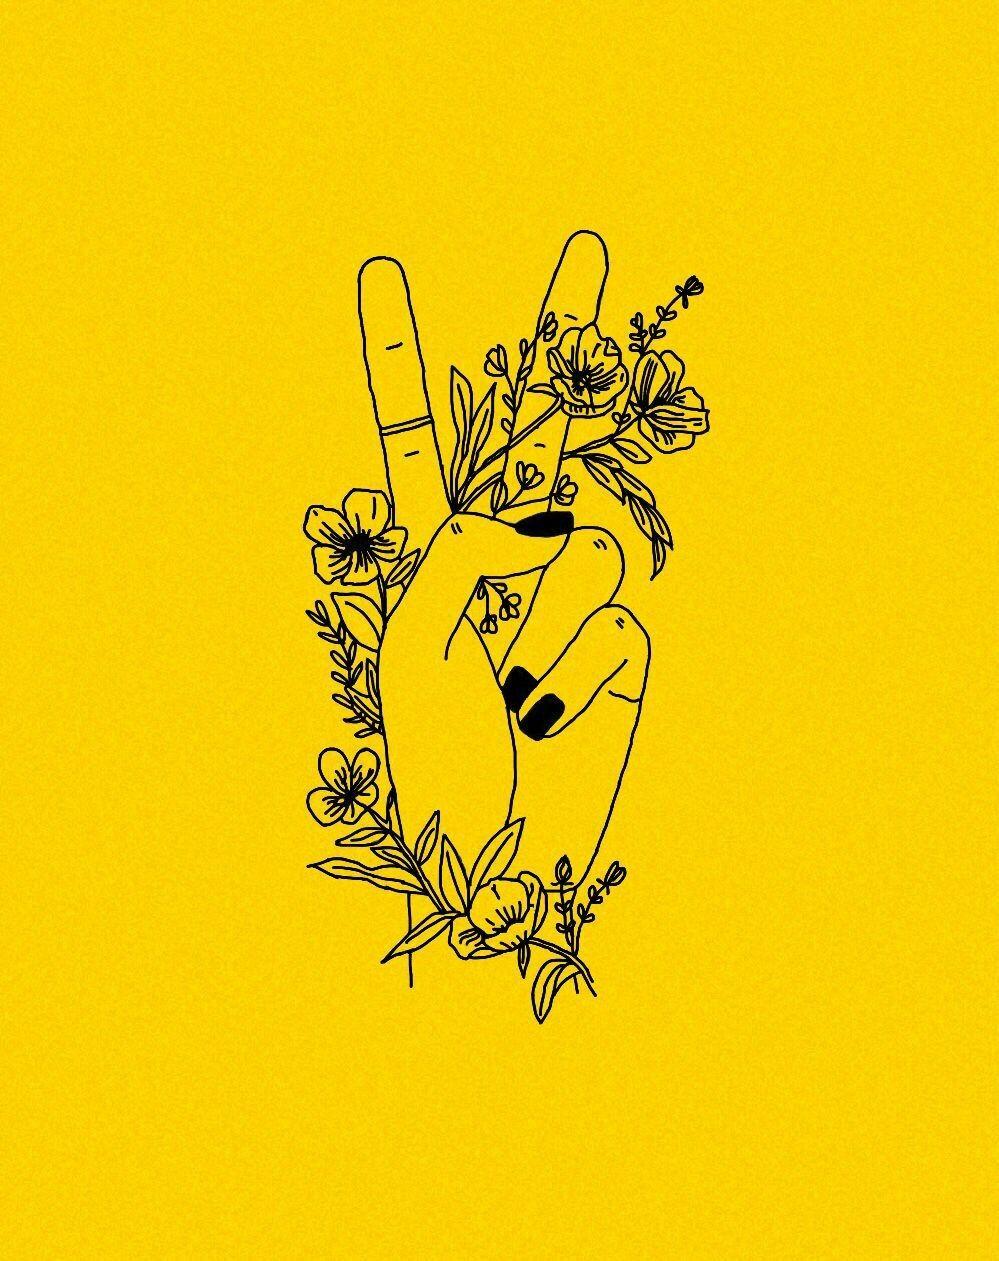 Artsy Yellow Aesthetic Art 749x946 Download Hd Wallpaper Wallpapertip